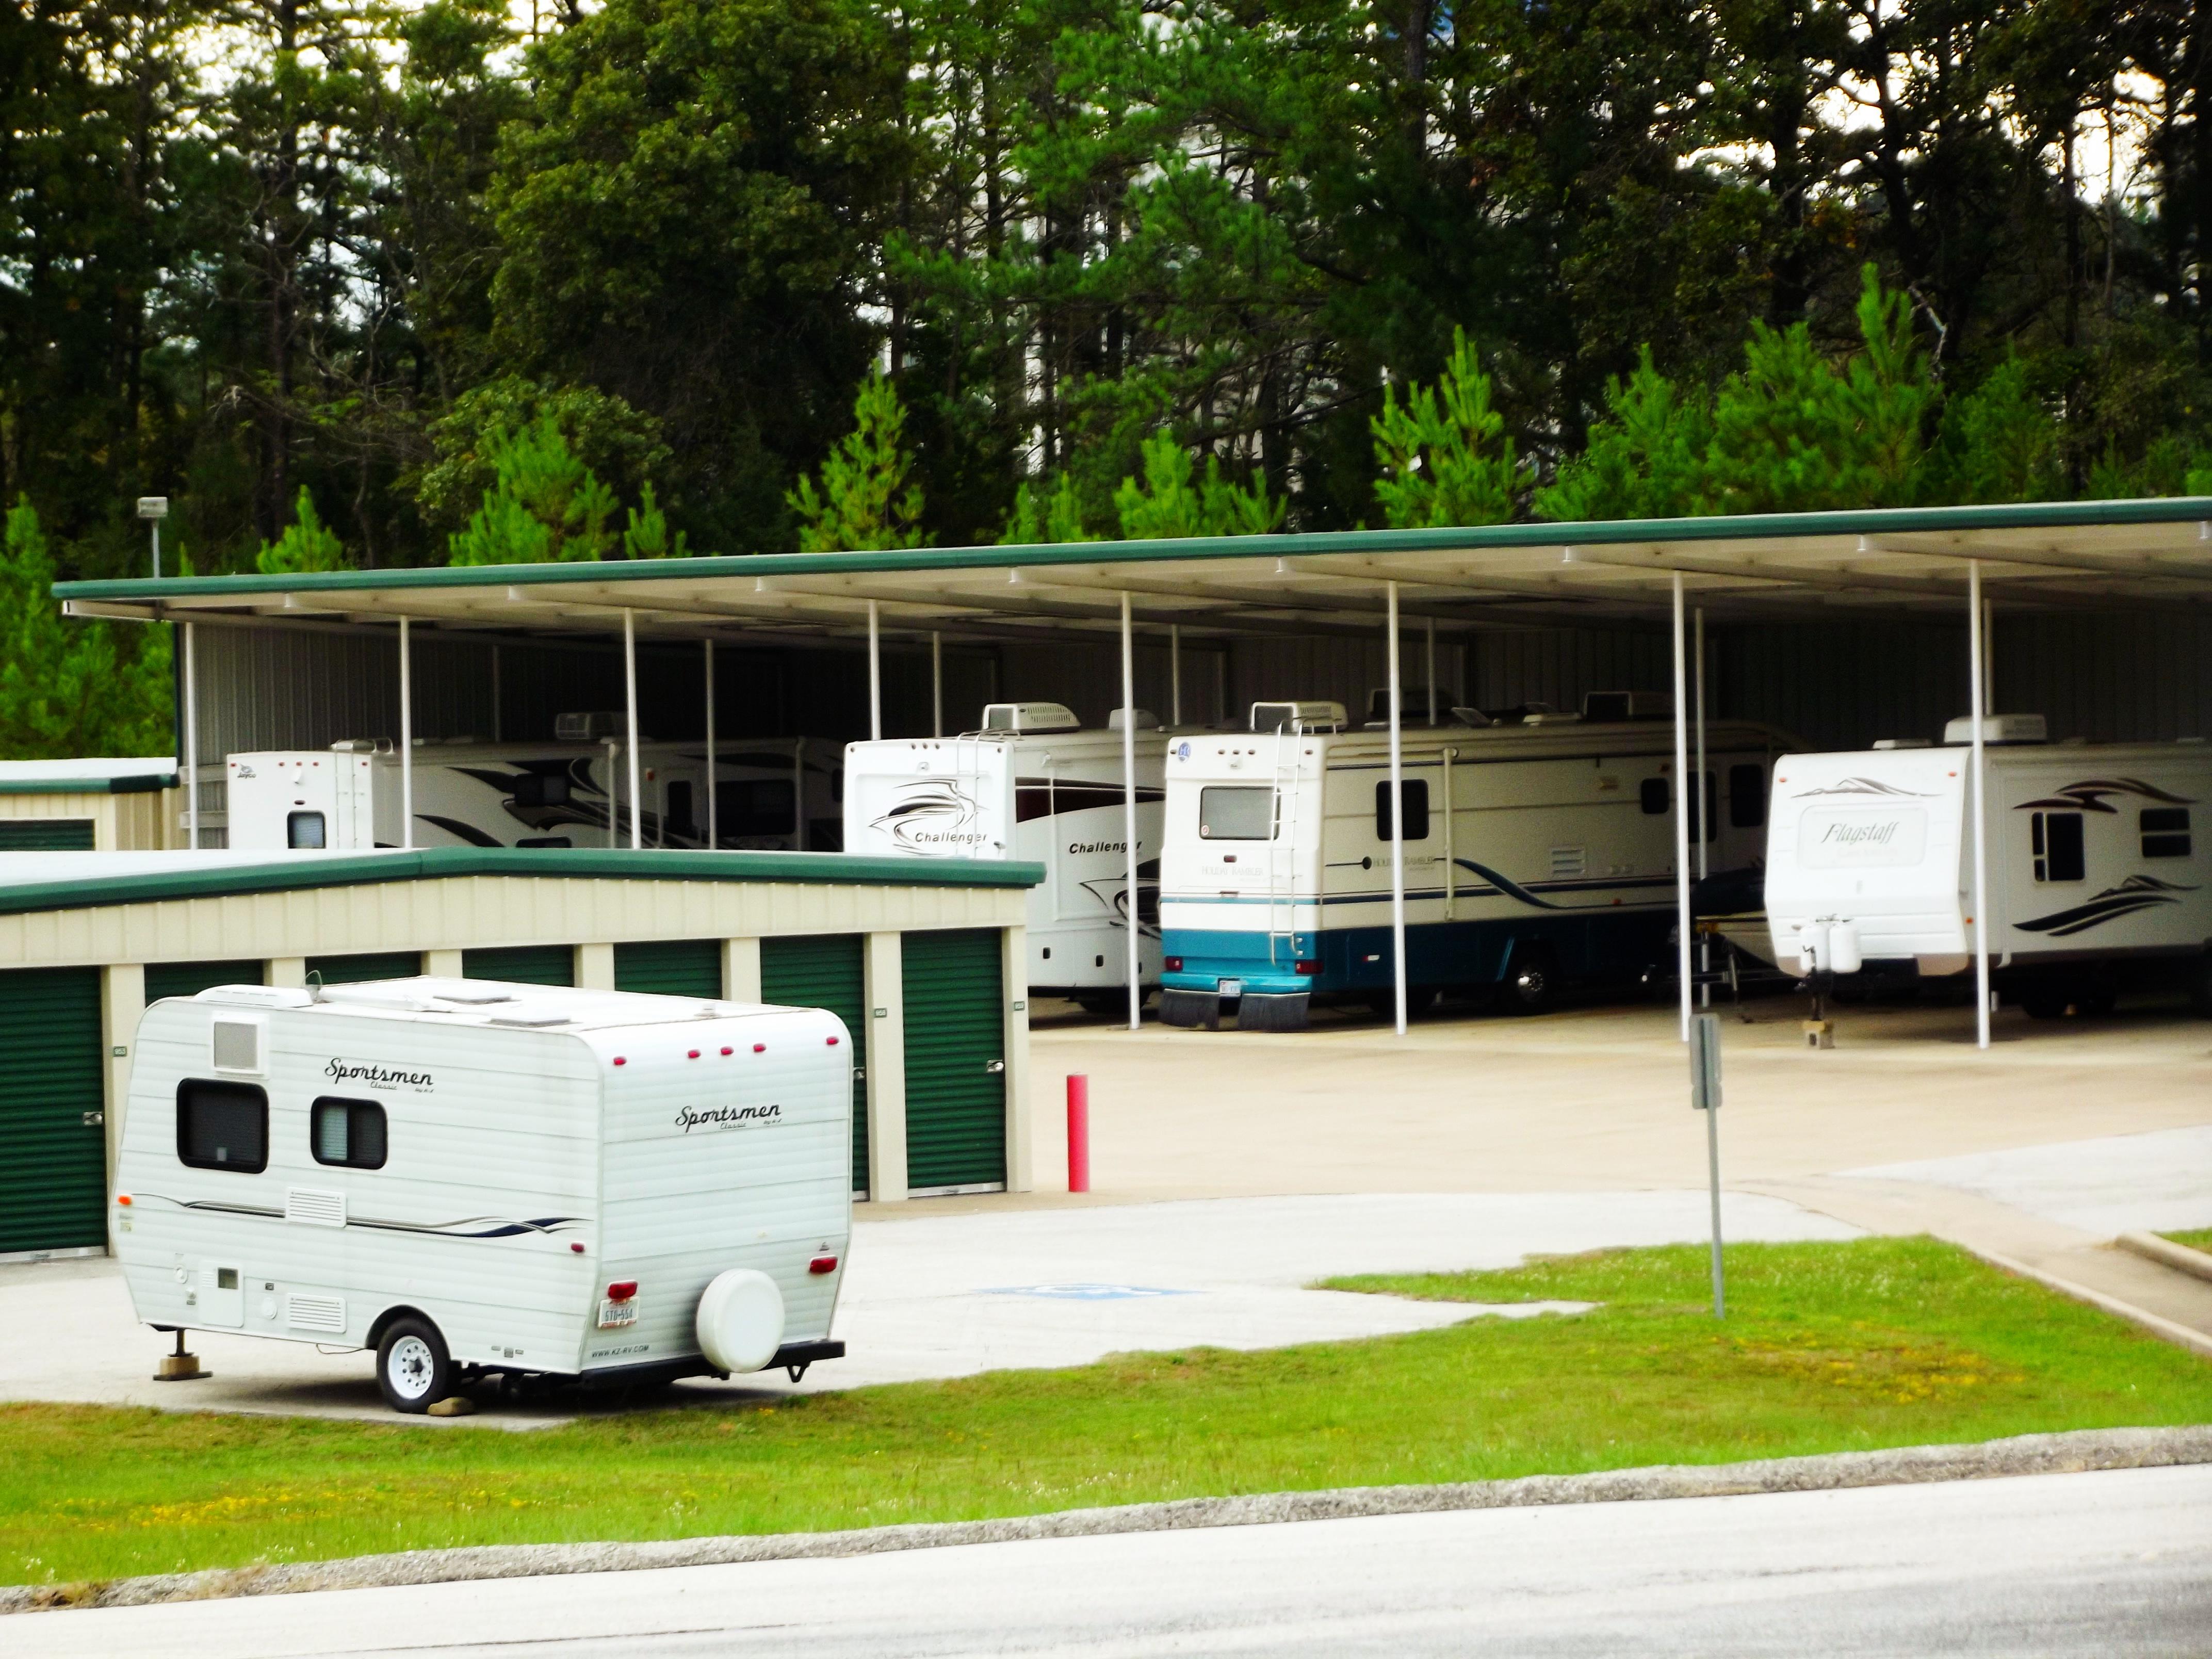 Boat & RV storage at Calloway Road Storage Center